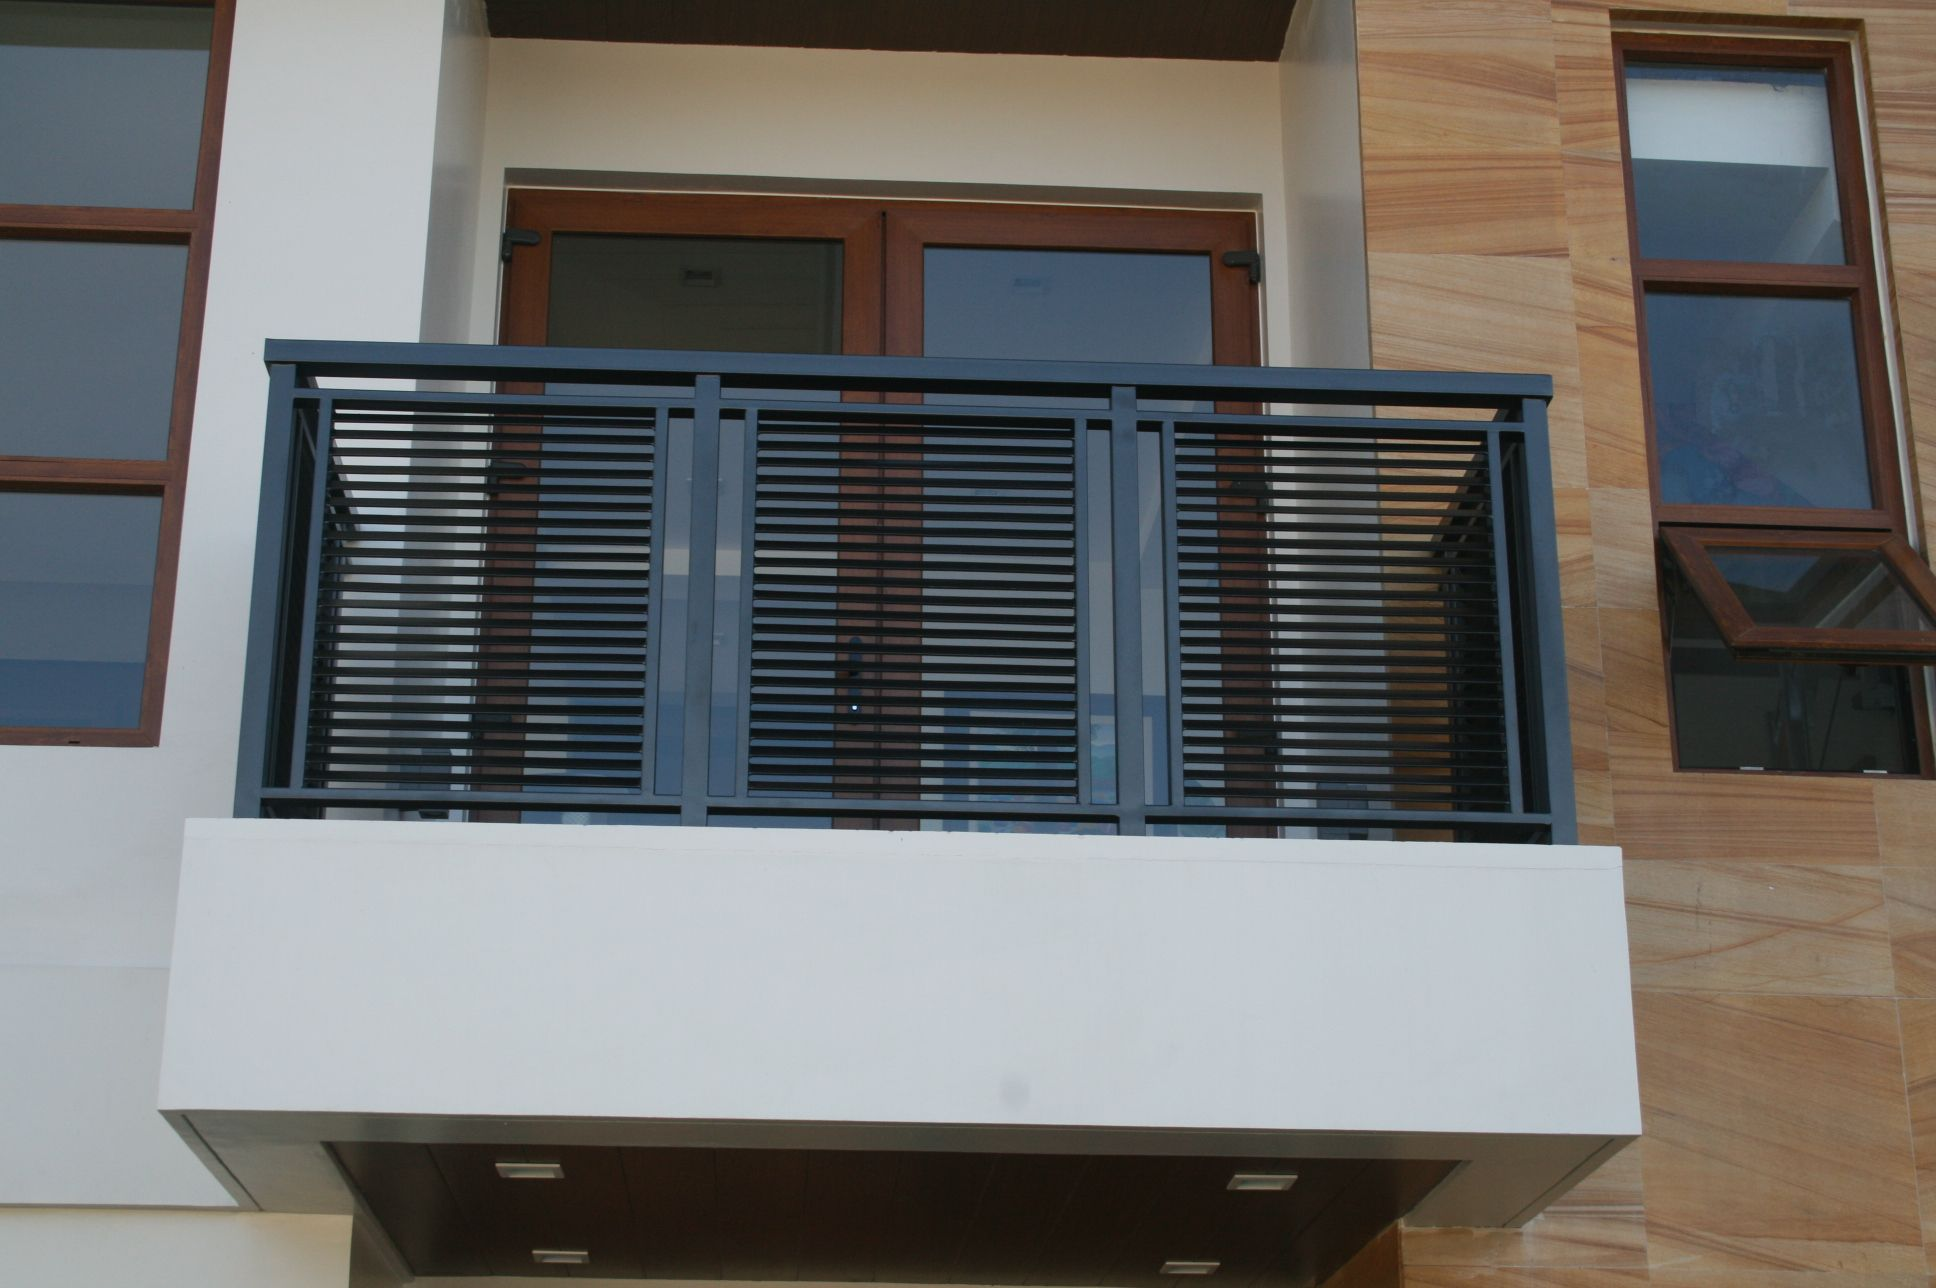 Modern Balcony Railing Philippines Balcony Railing Design Balcony Grill Design Railing Design